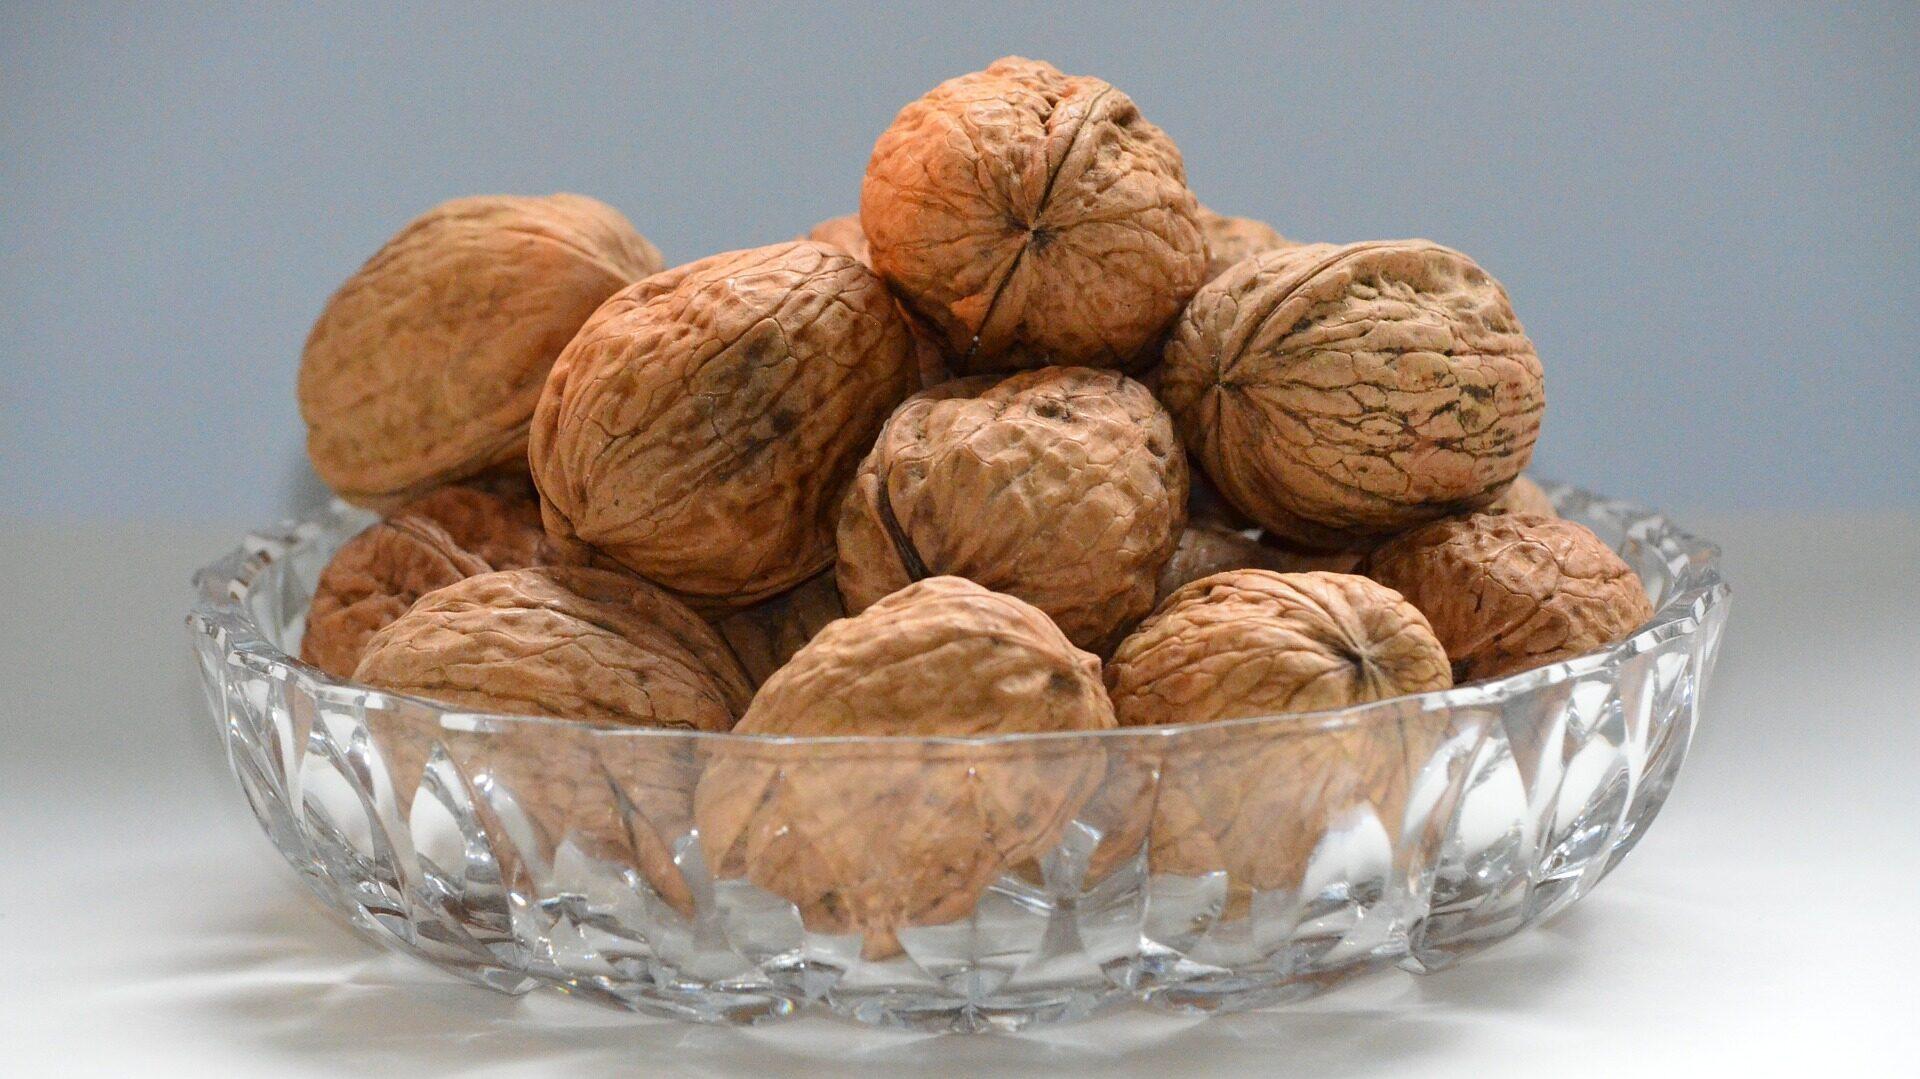 Орехи влияют на половую функцию у мужчин